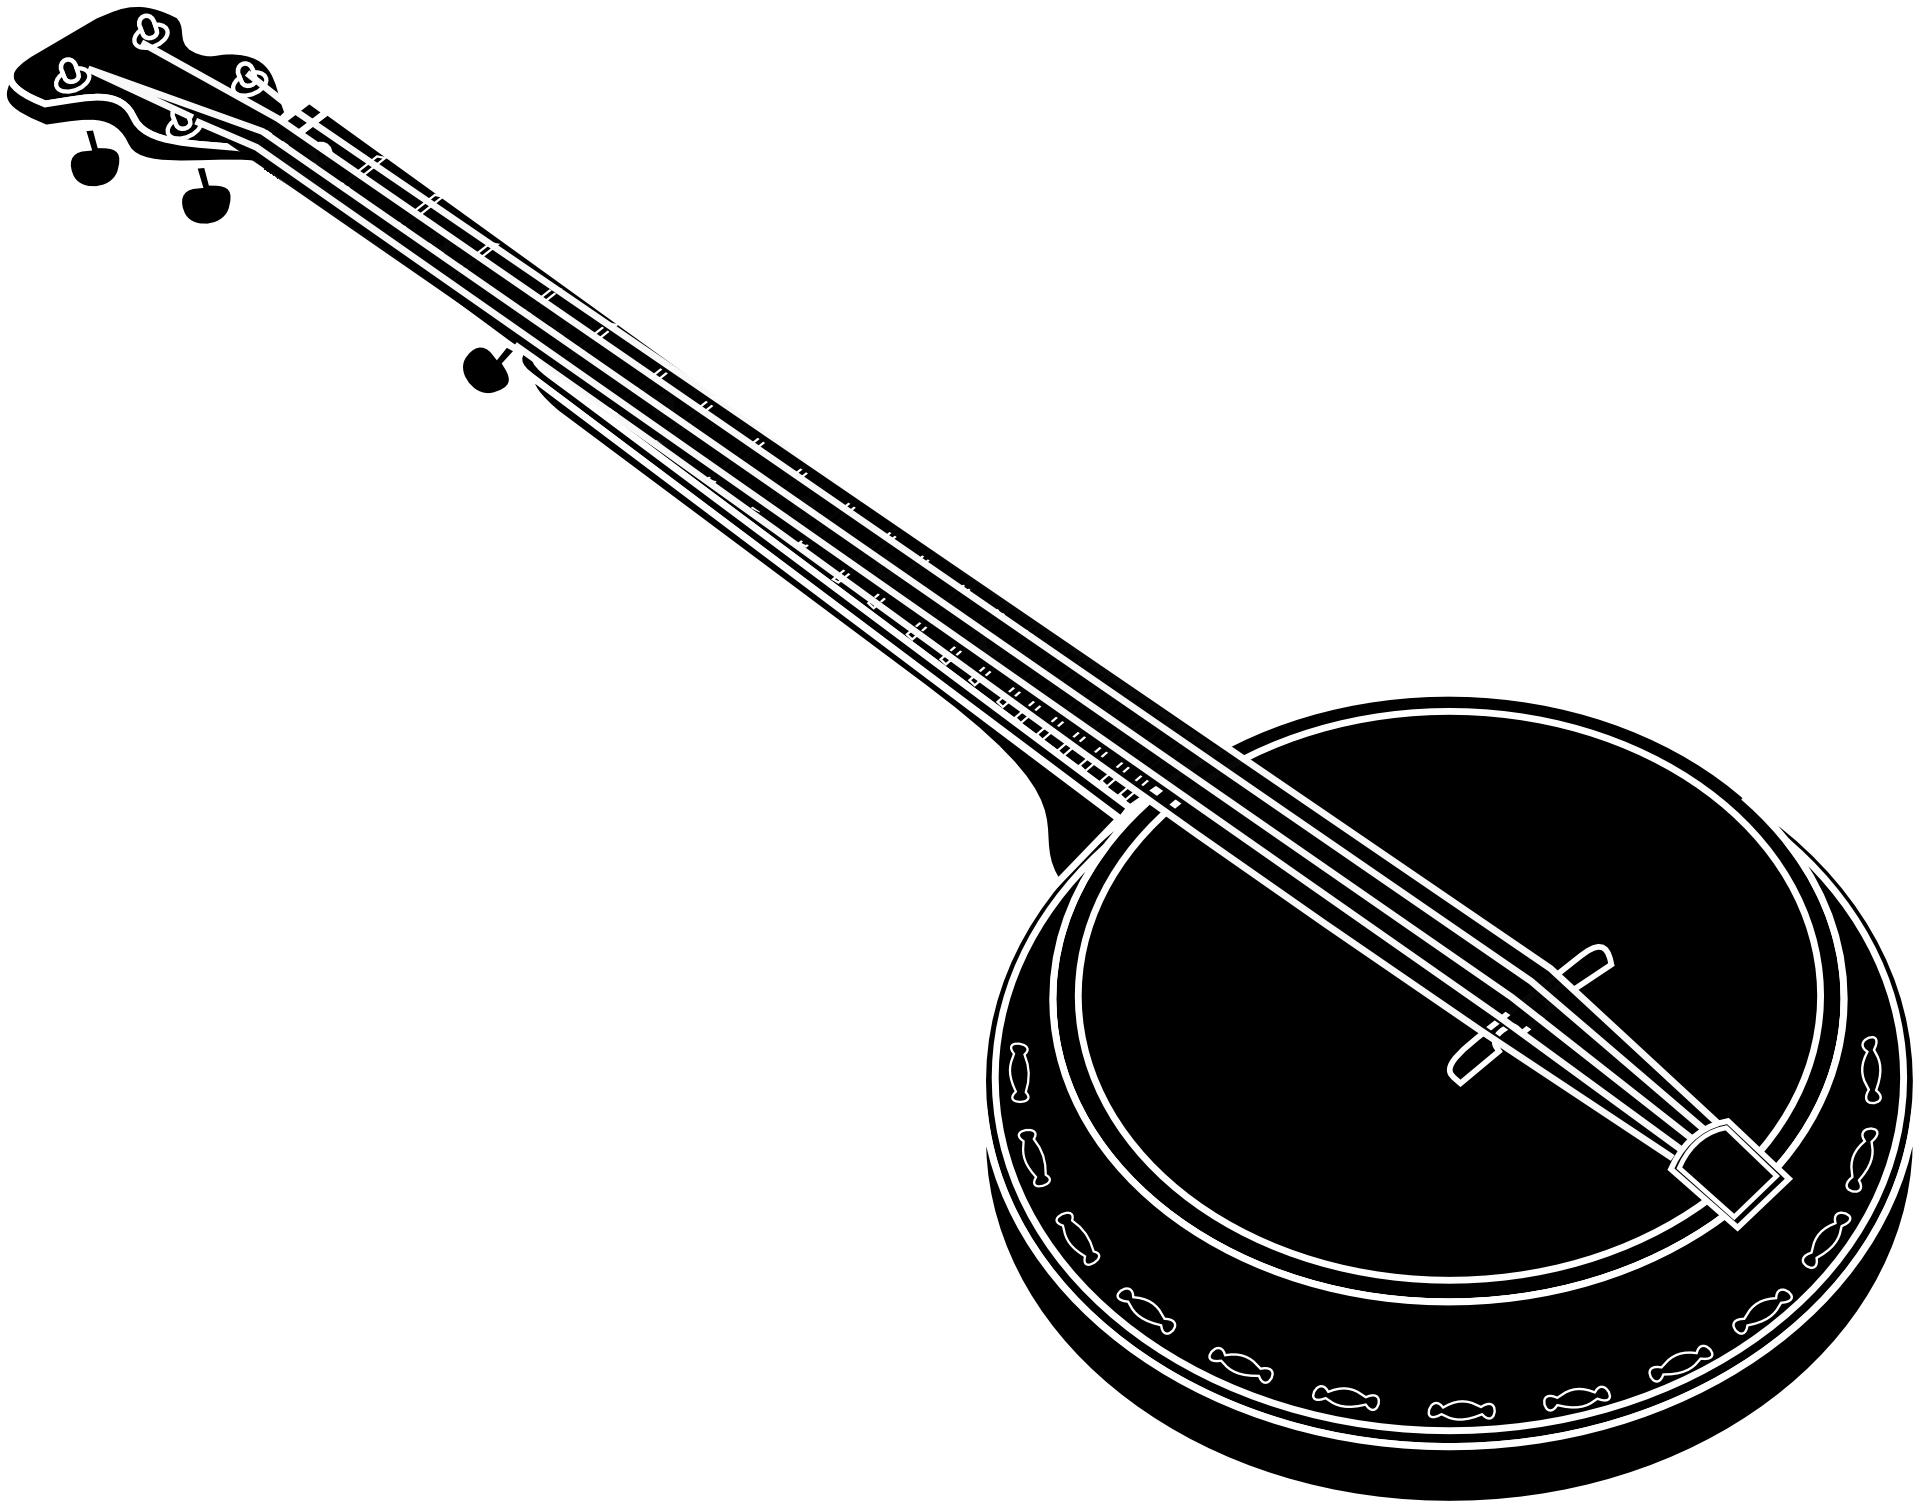 Musician clipart folk music. Banjo drawing musical instruments